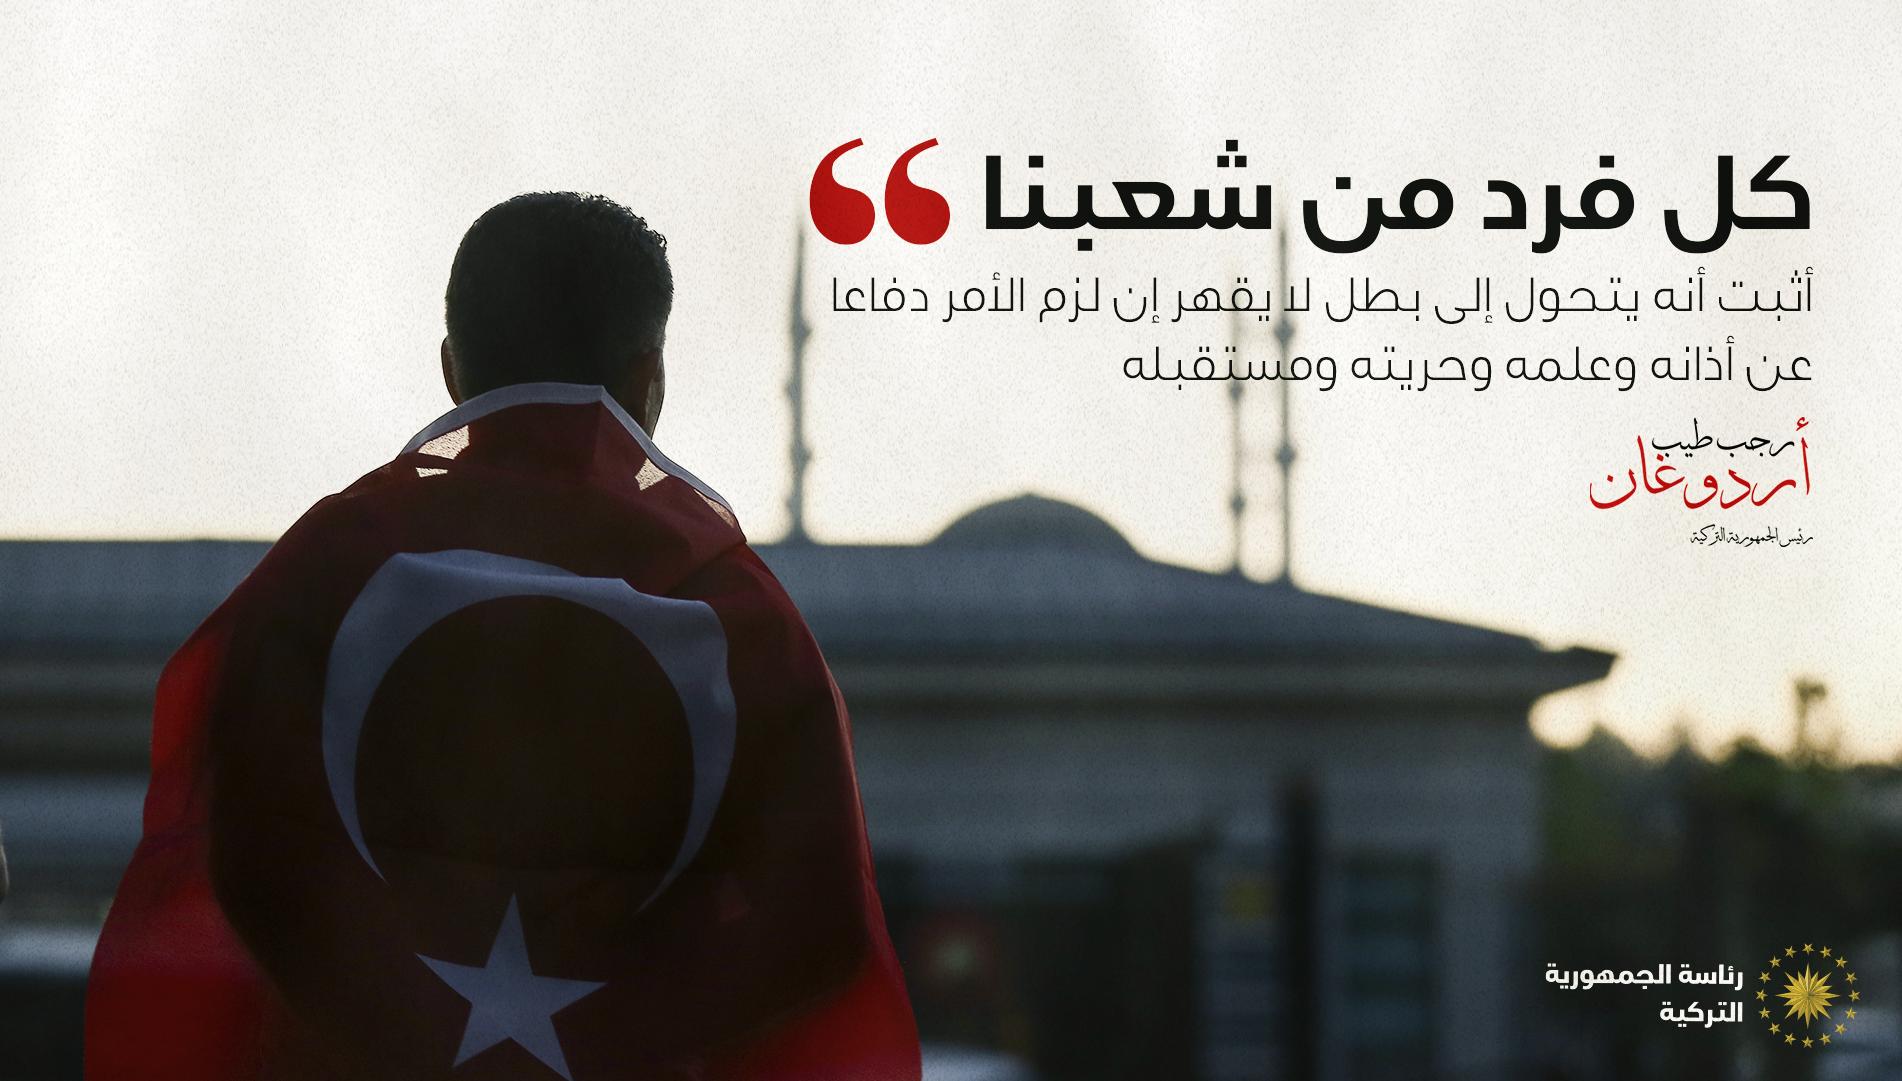 Ec bil6XYAADunp - الرئيس التركي يغرد على حسابه الشخصي بمناسبة ذكرى 15 تموز